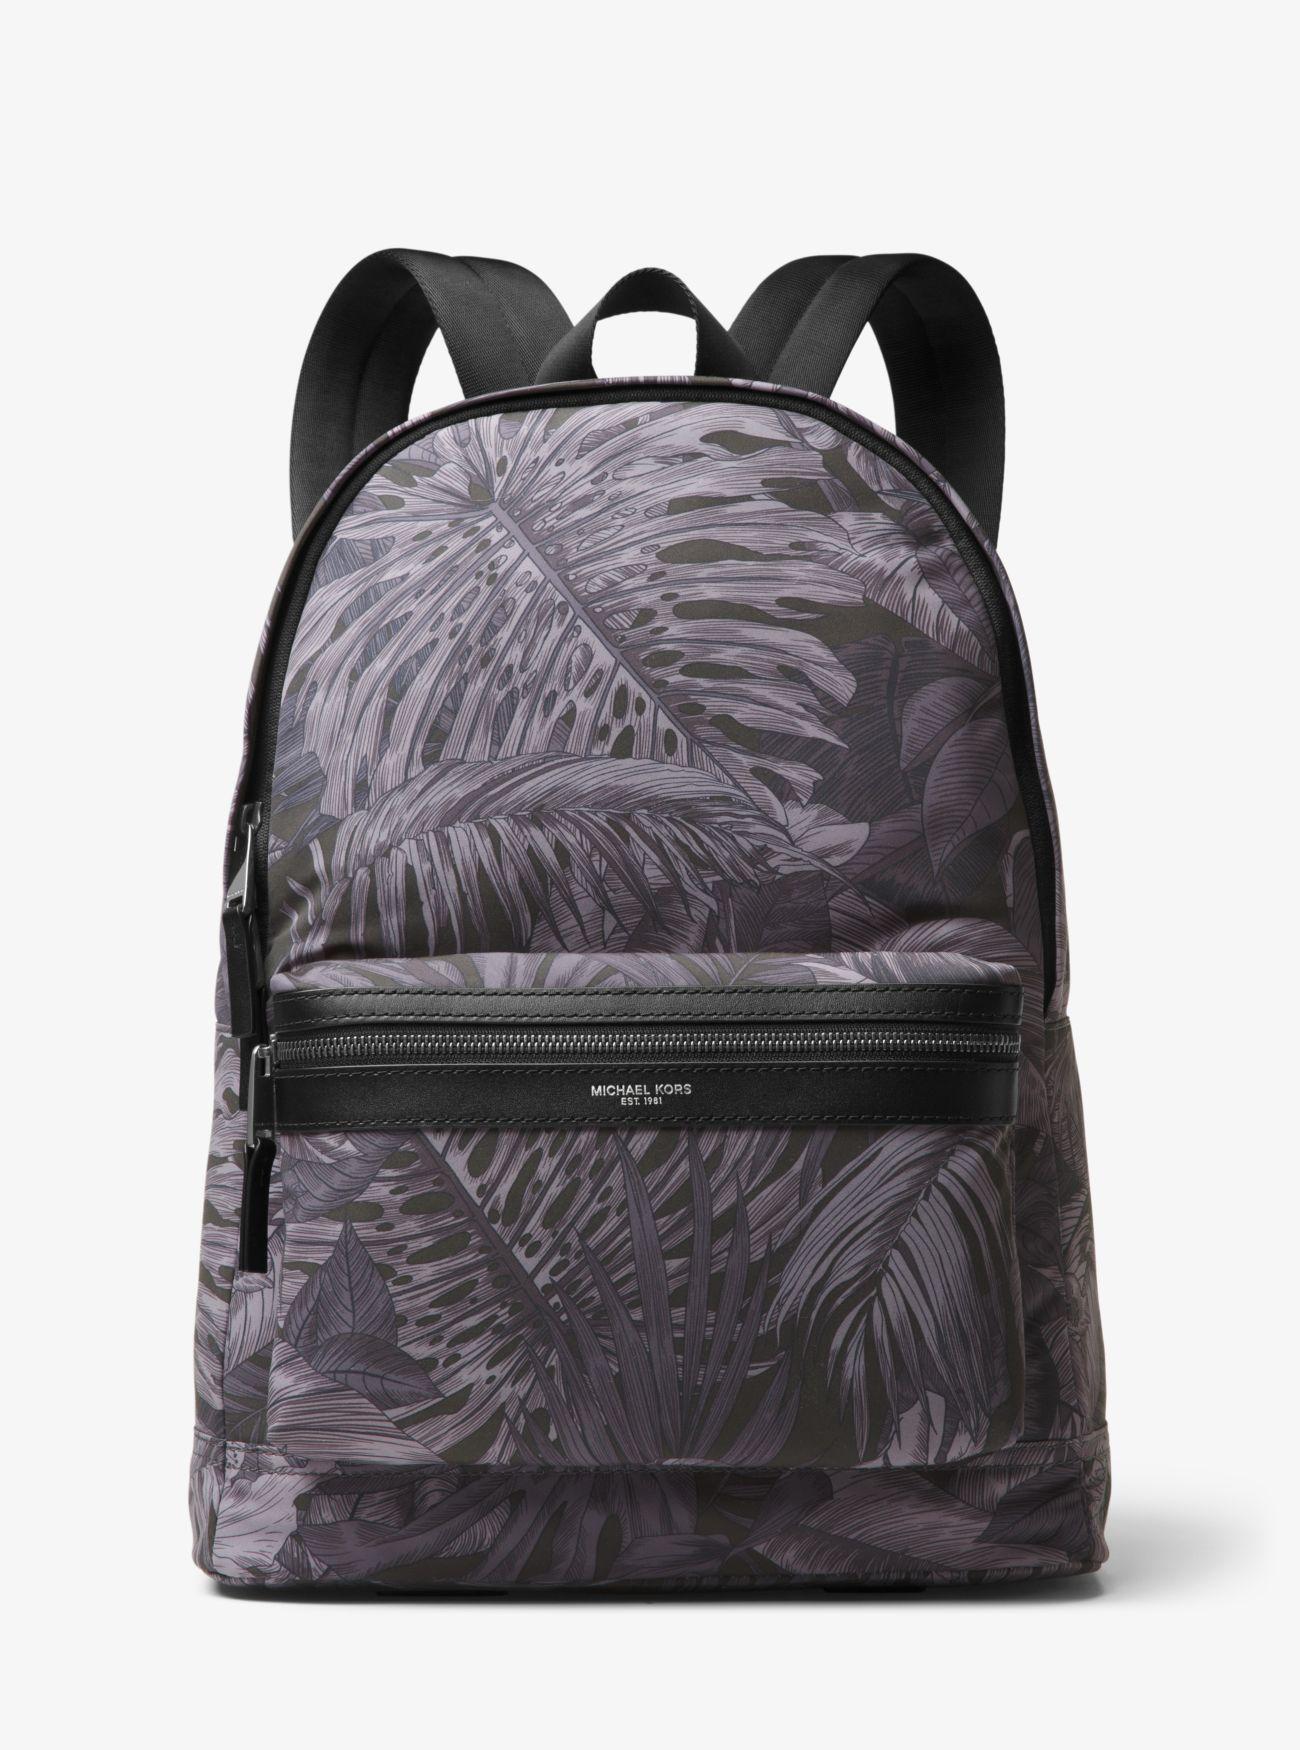 770092c2bdf5 Michael Kors Kent Tropical Backpack in Black for Men - Save 48% - Lyst